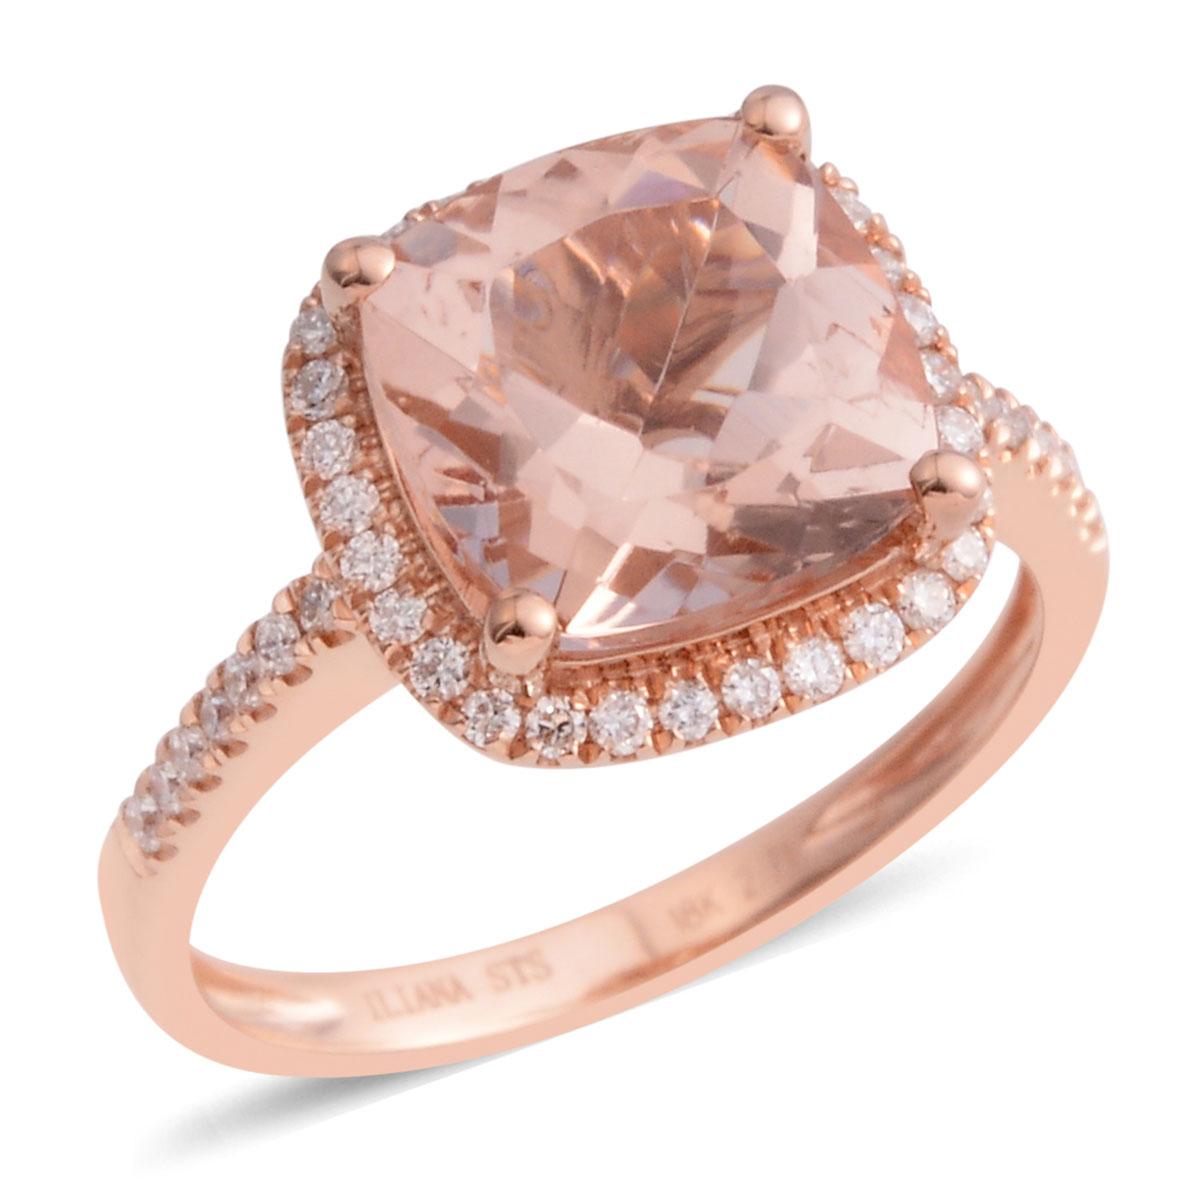 New Rose Gold 3 Cttw Cushion Morganite Fashion Ring for Women | eBay